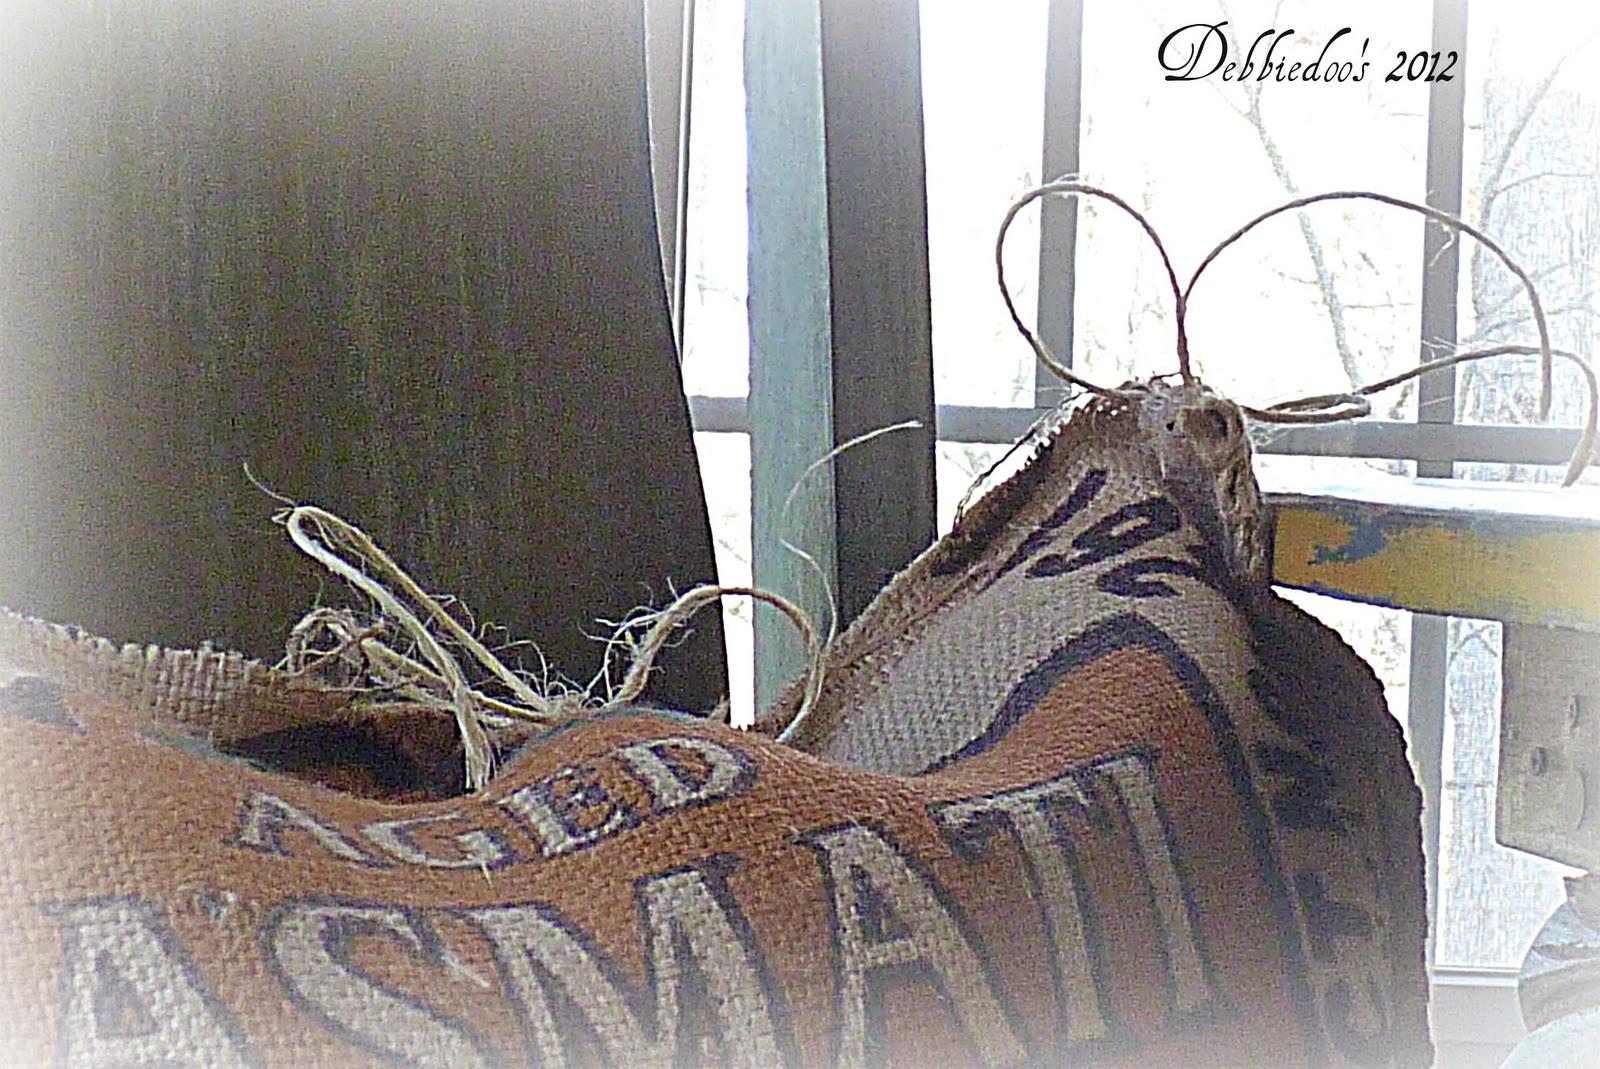 Poked small holes in the burlap to tie the twine on top. & DIY no Sew burlap pillow grain sacks - Debbiedoo\u0027s pillowsntoast.com